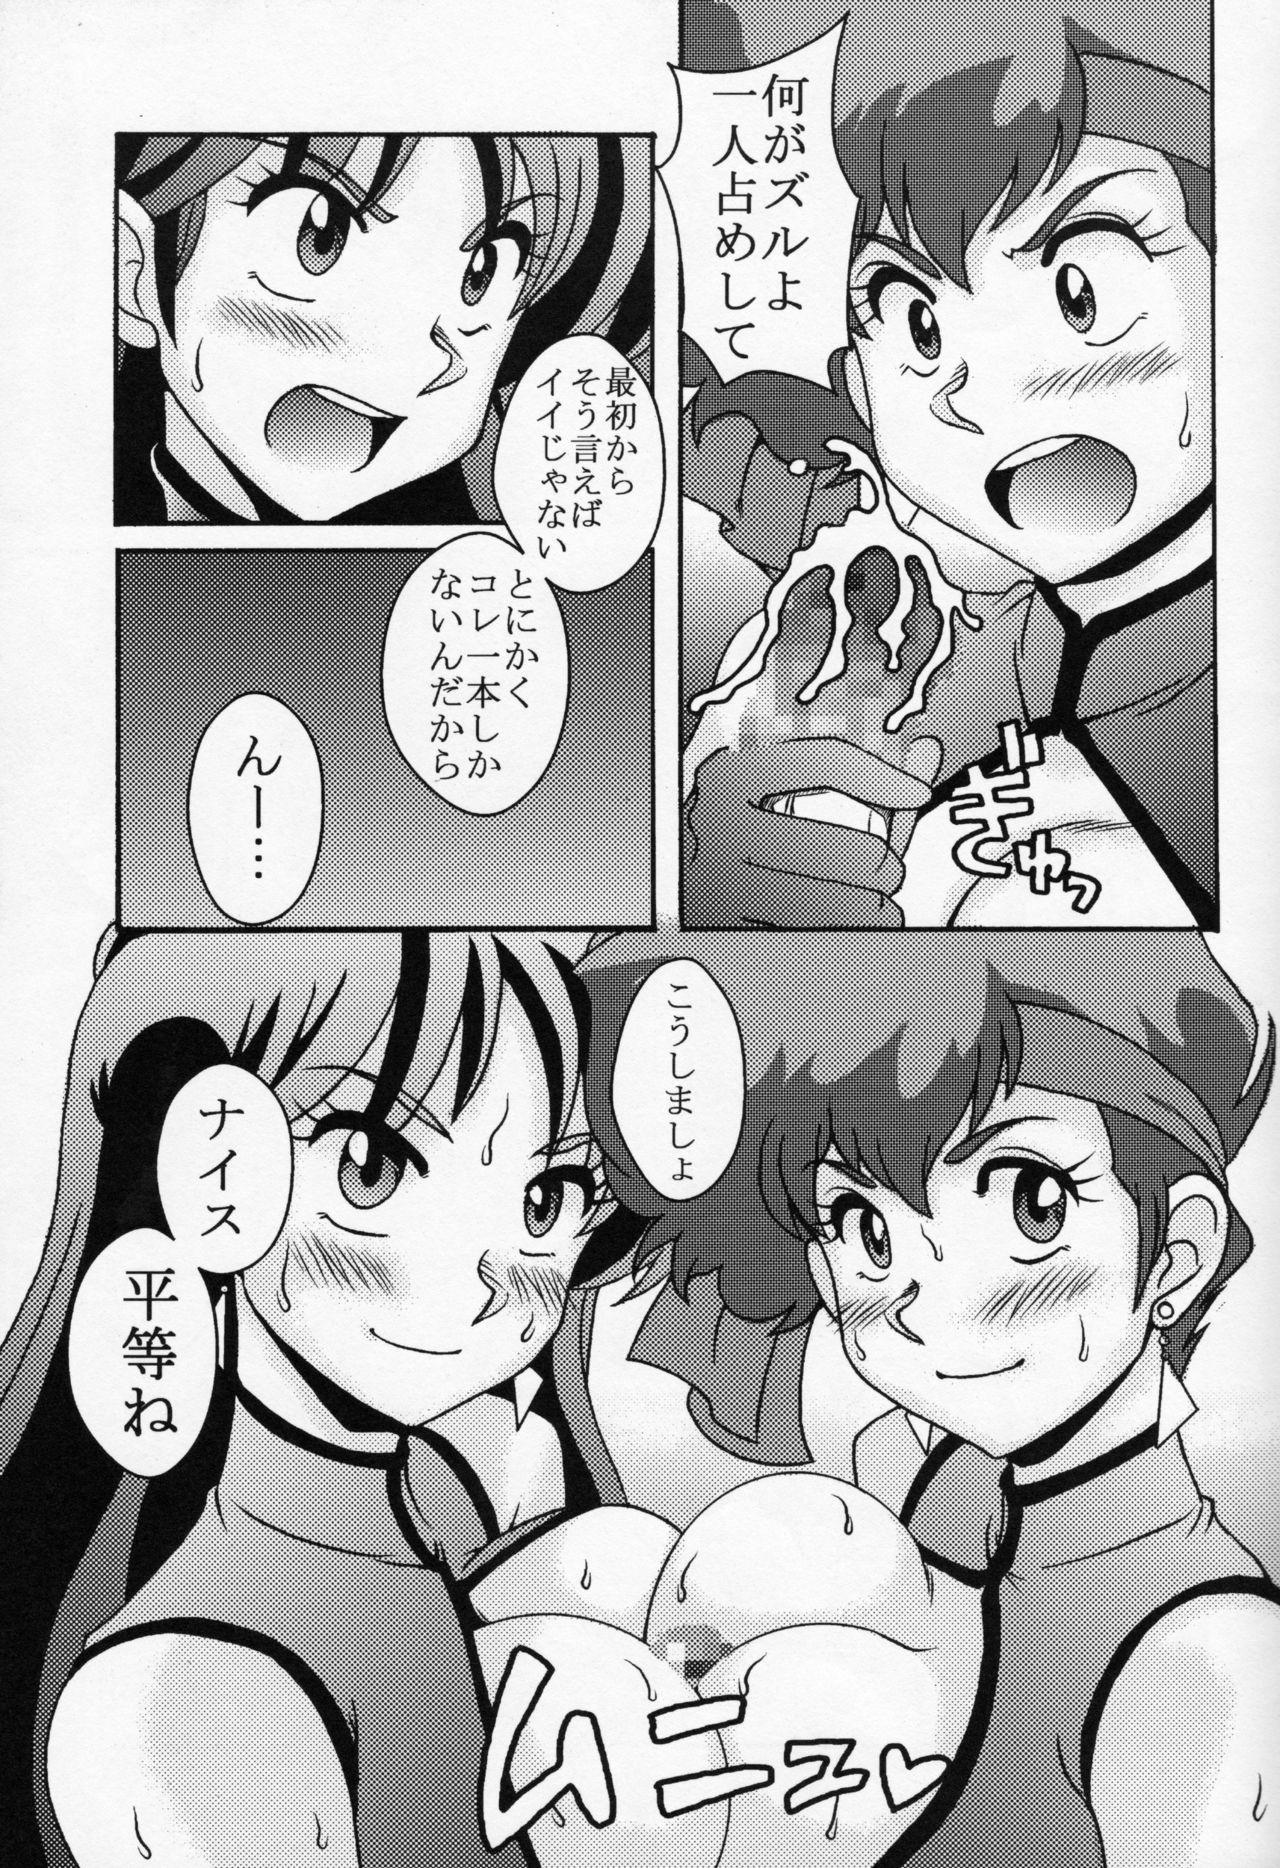 Kei to Yuri 9